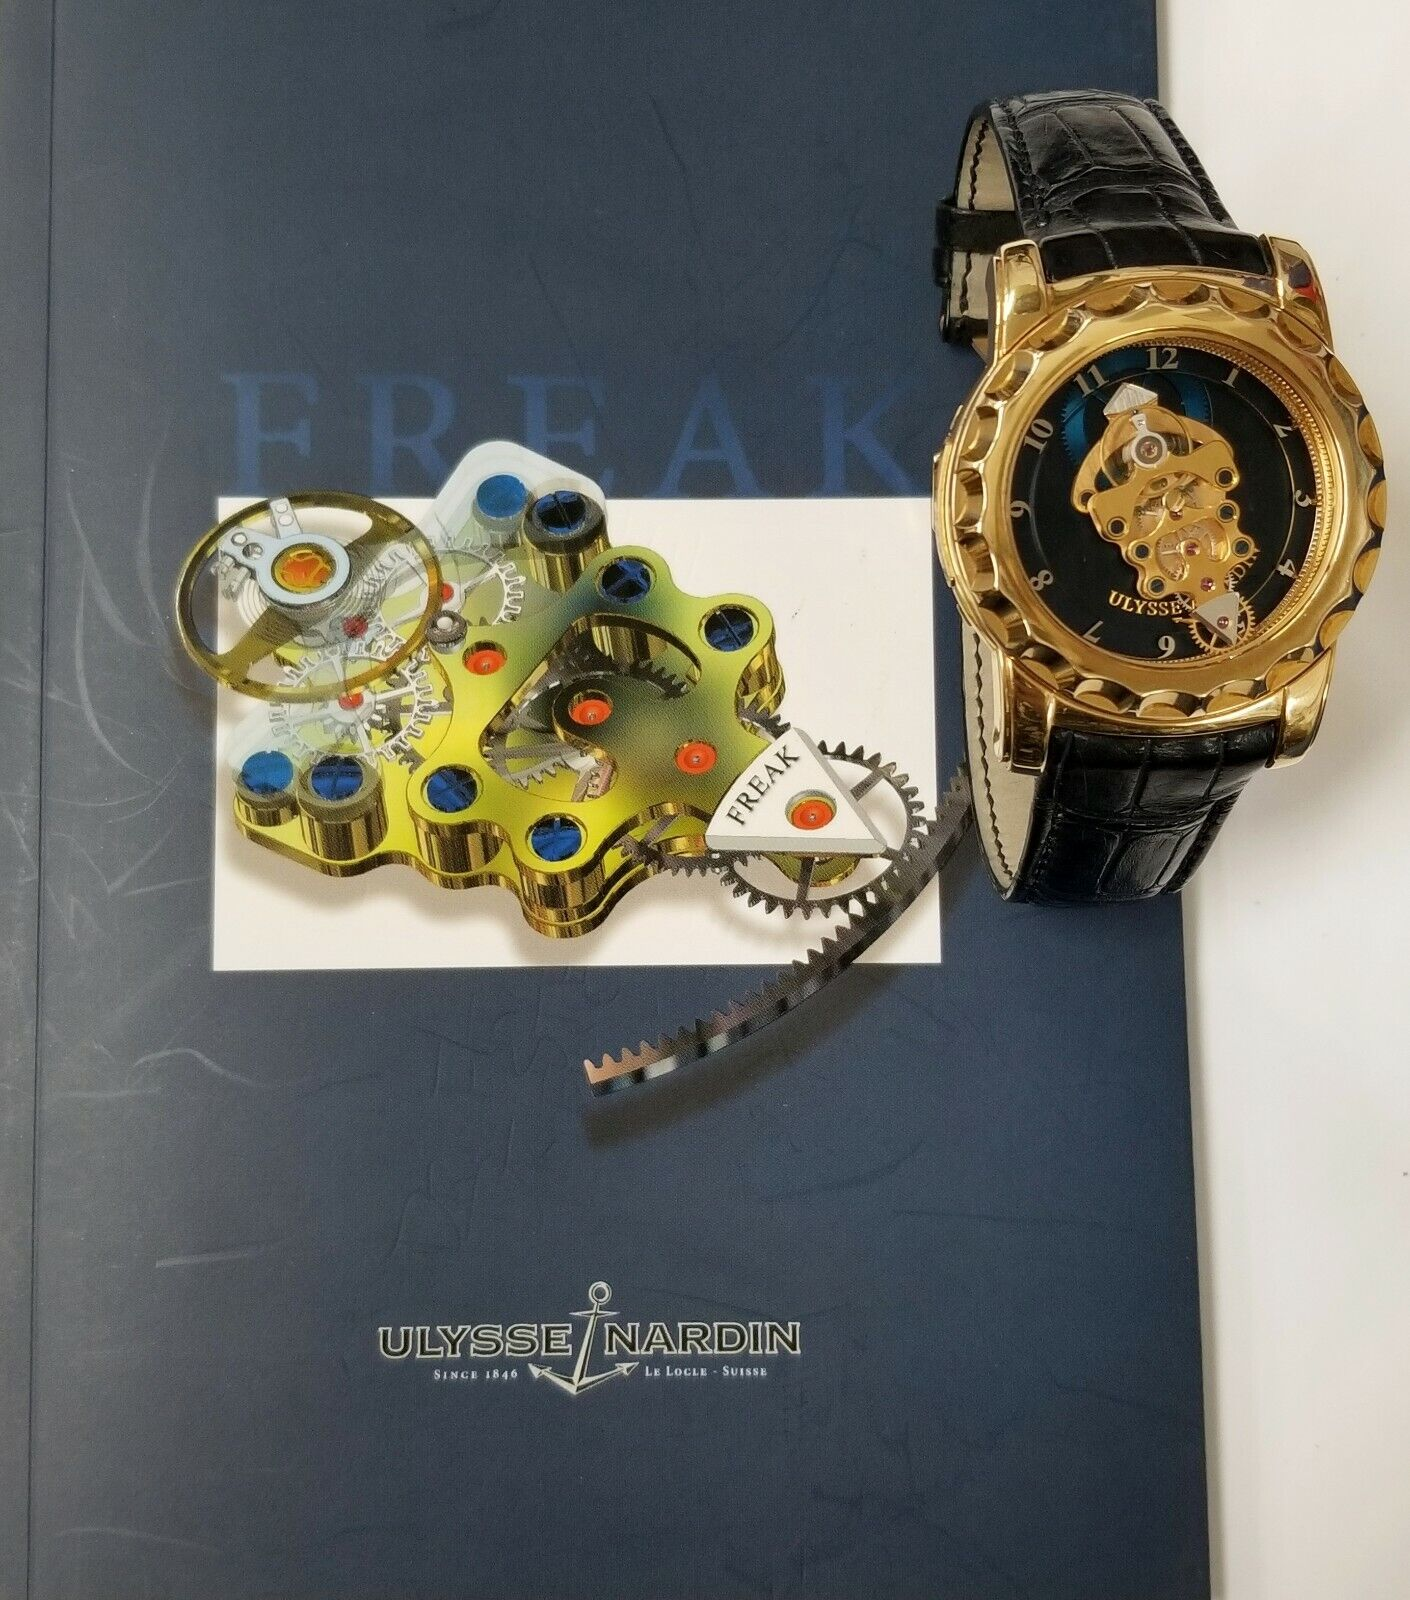 Ulysse Nardin Freak Tourbillon 18k Gold Watch  Deployant Clasp Box Papers 016-88 - watch picture 1